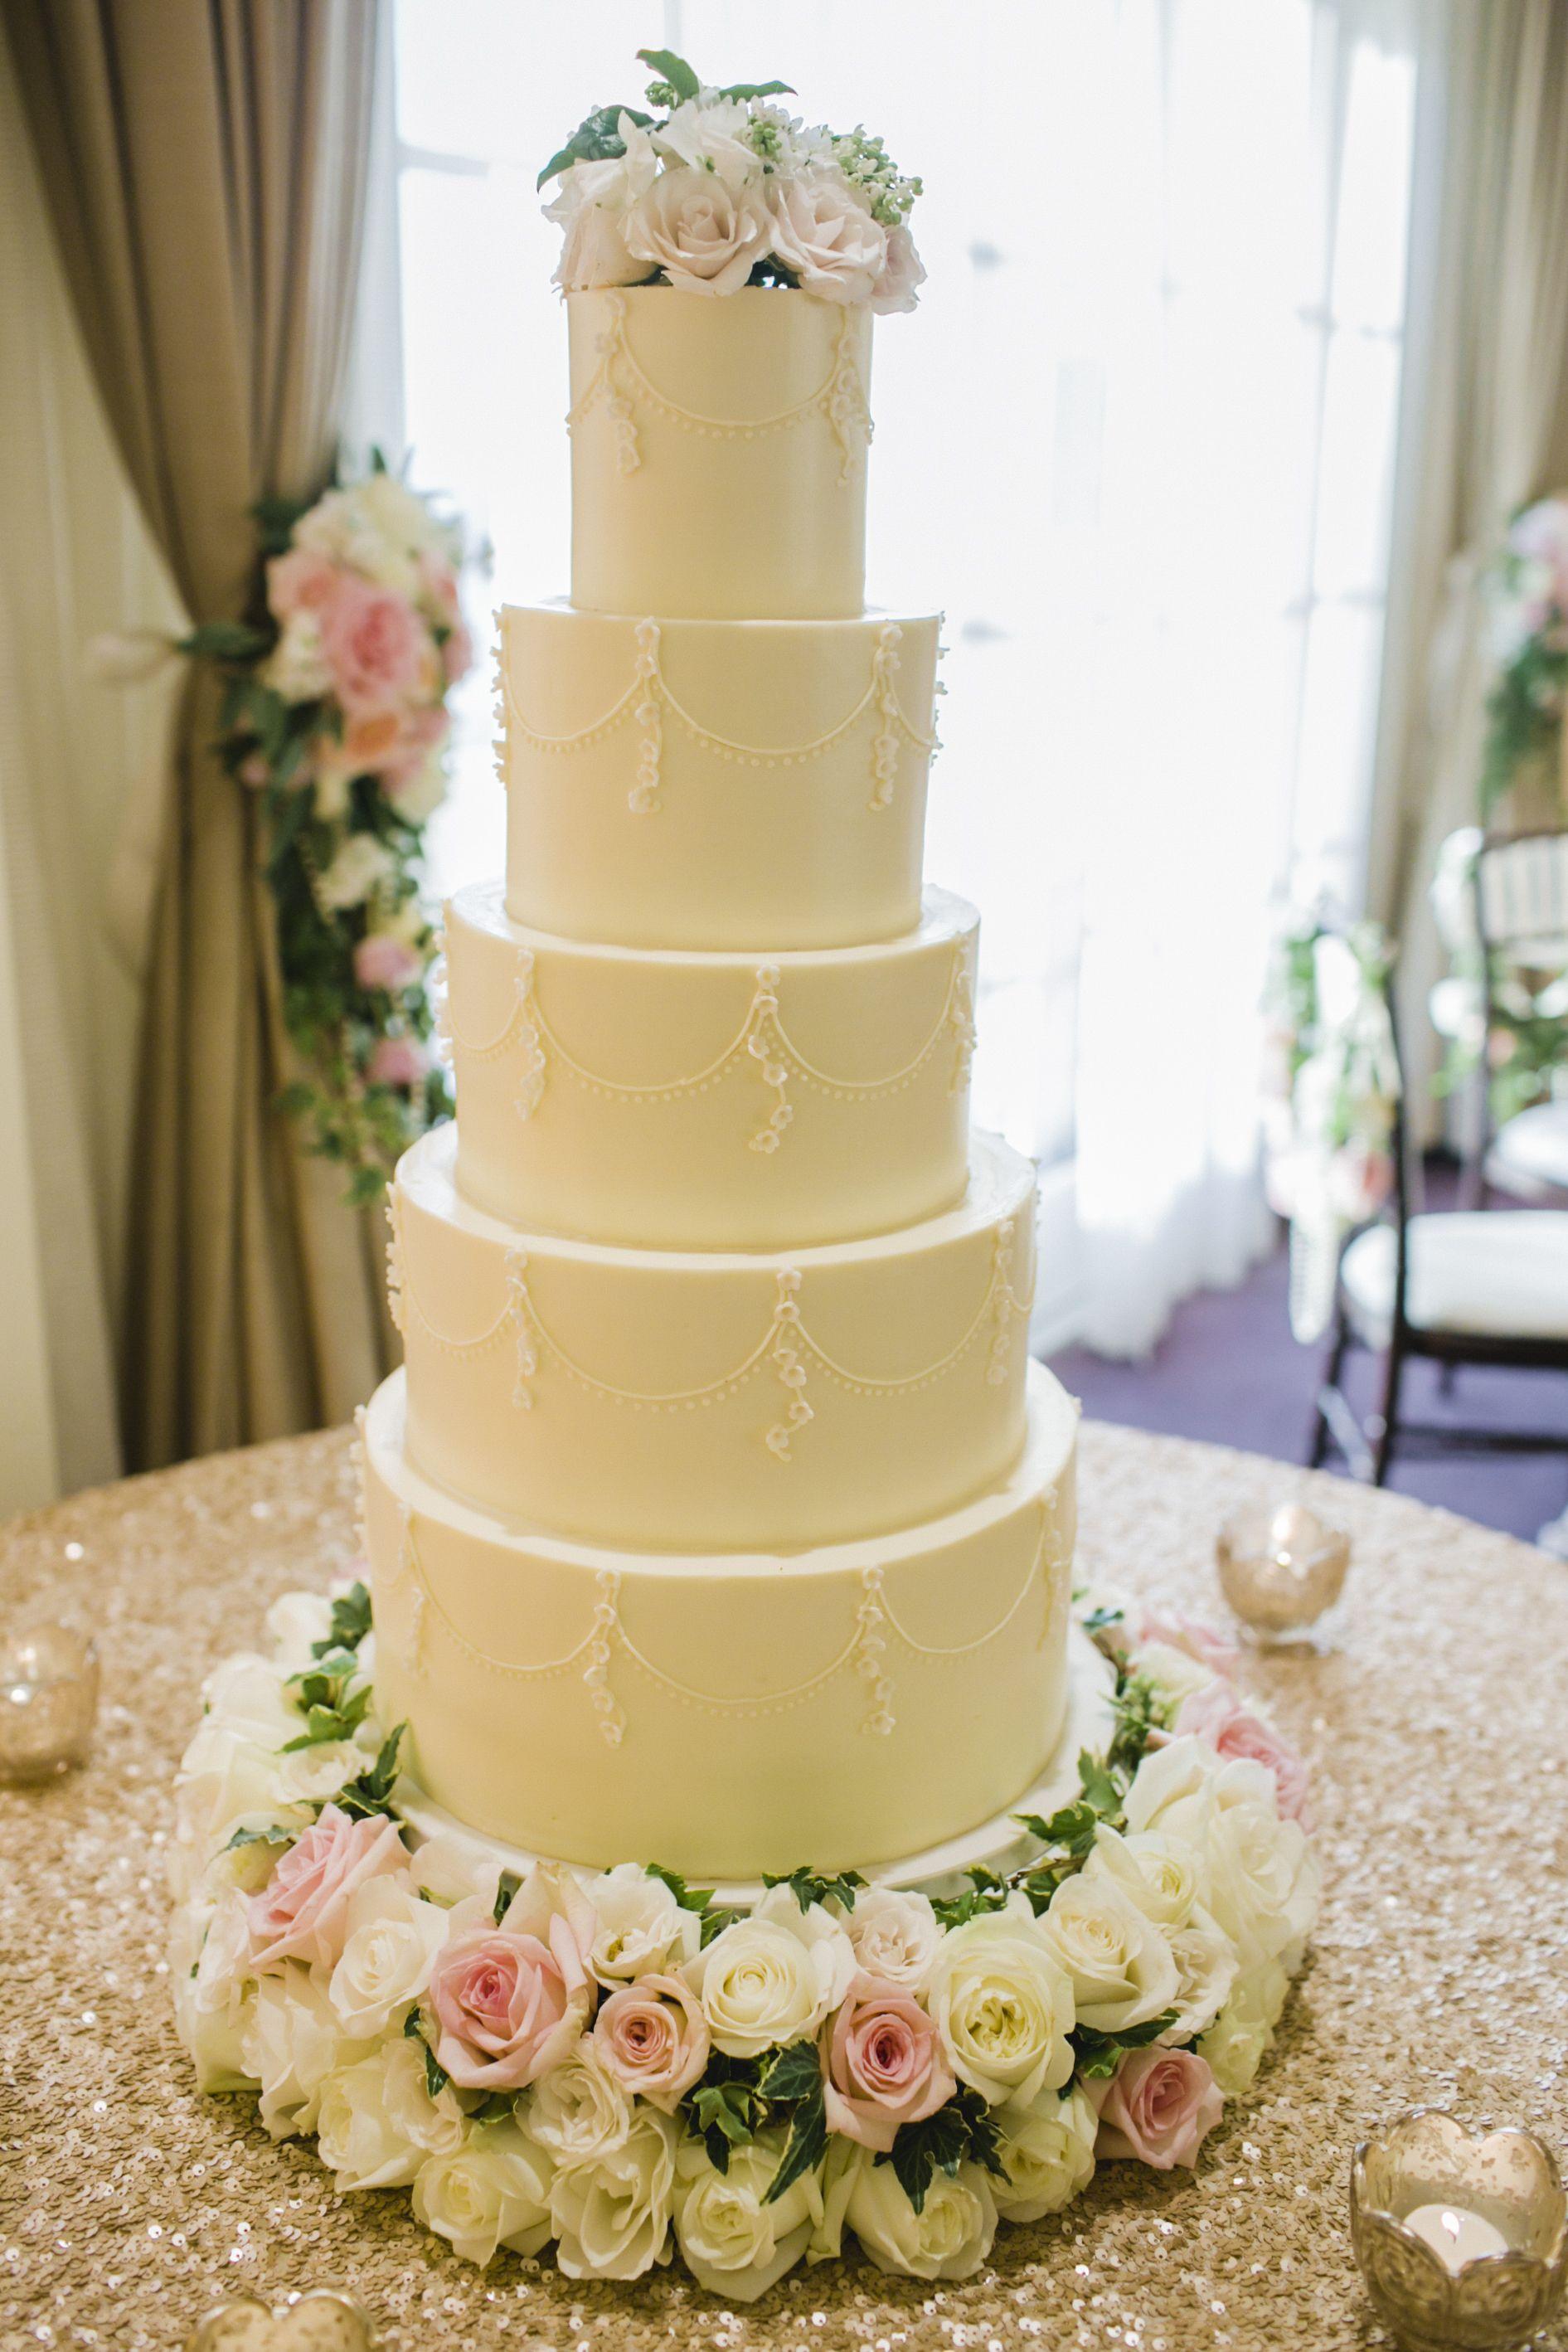 Large wedding cake. 5 tier cake. Flower cake stand. Roses